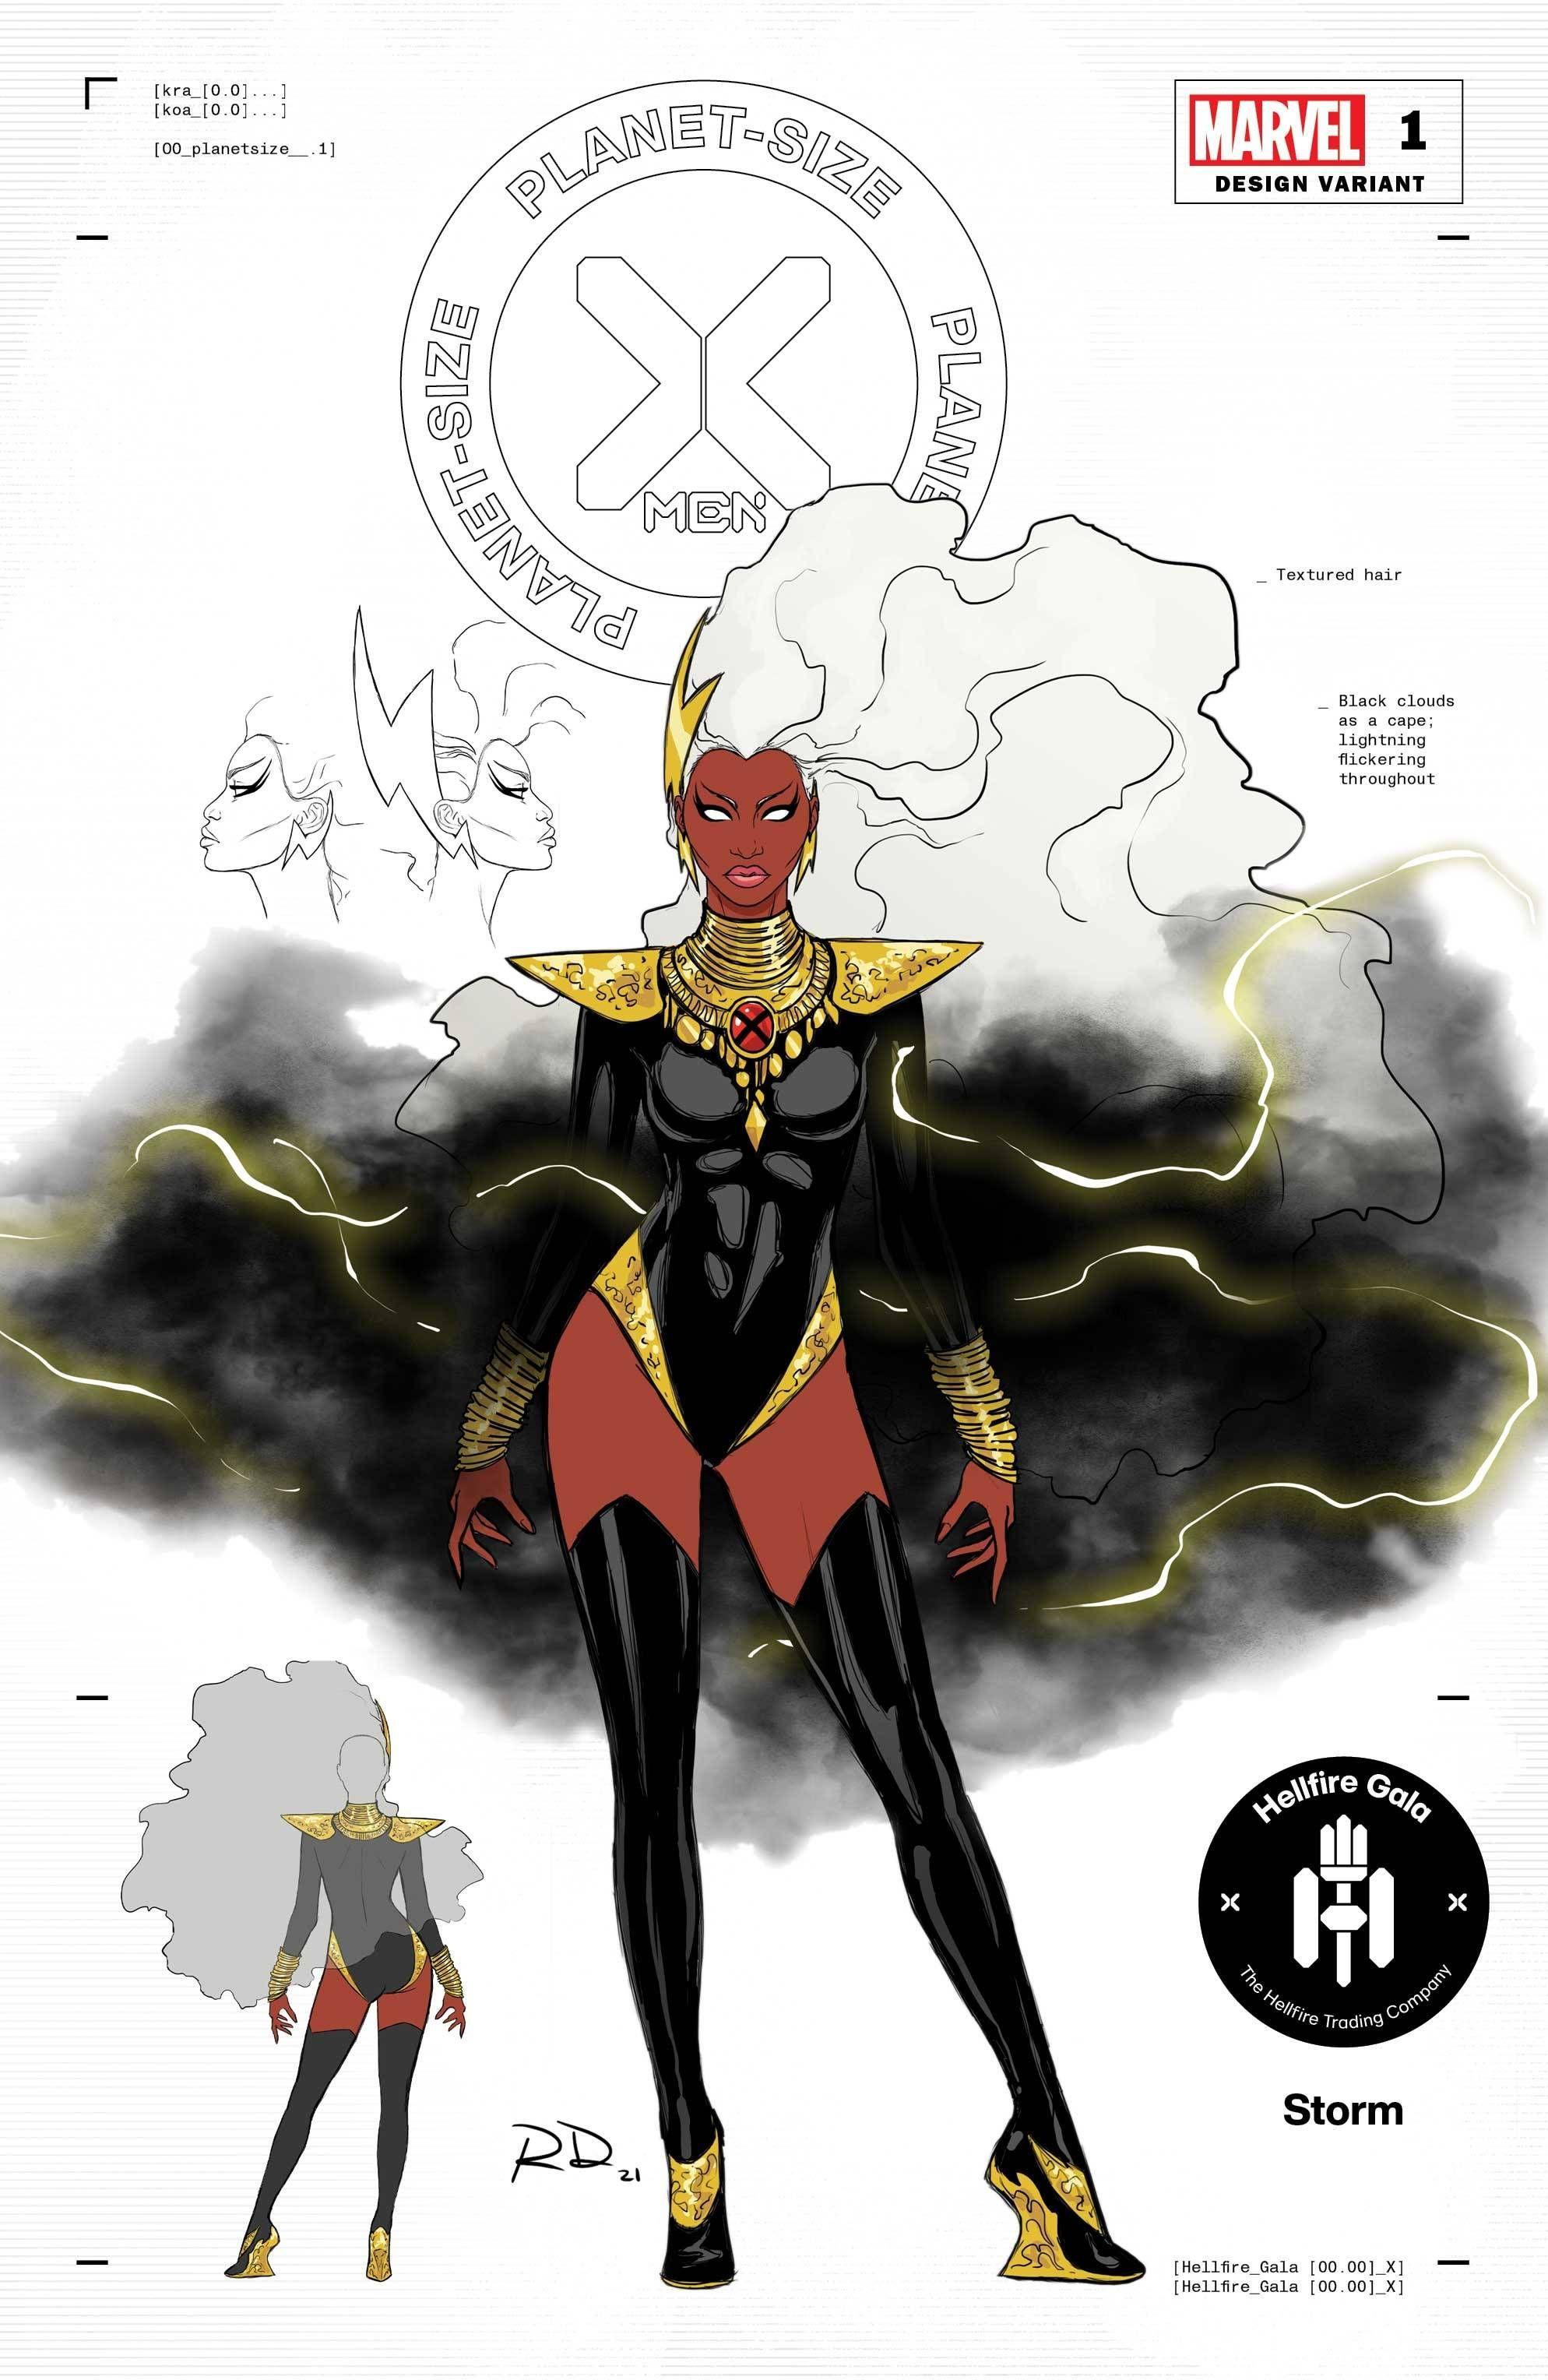 eyJidWNrZXQiOiJnb2NvbGxlY3QuaW1hZ2VzLnB1YiIsImtleSI6IjEyYzViZjI0LTYwMDQtNDY0My1hZjA1LTQwMmE2NGUzZjkwNi5qcGciLCJlZGl0cyI6W119 ComicList: Marvel Comics New Releases for 06/16/2021